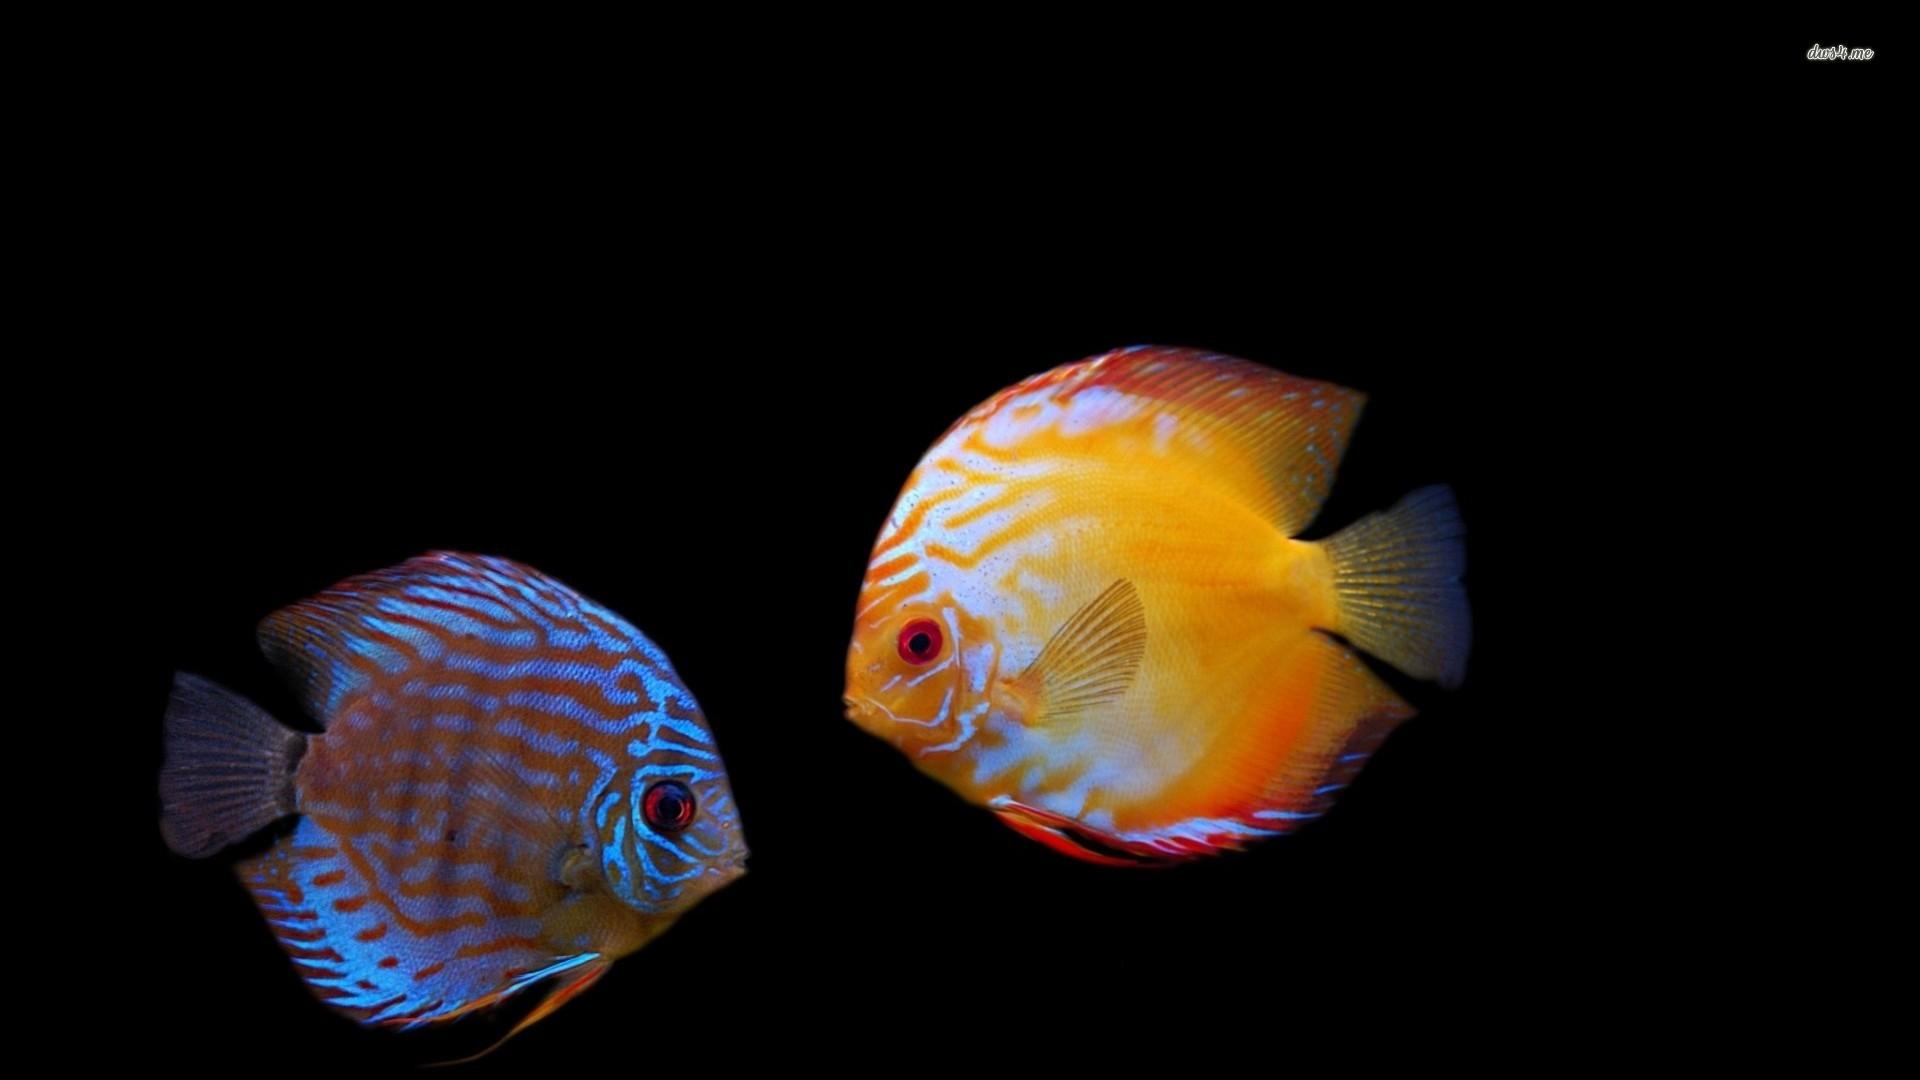 Fish Wallpaper 803 HD Cool